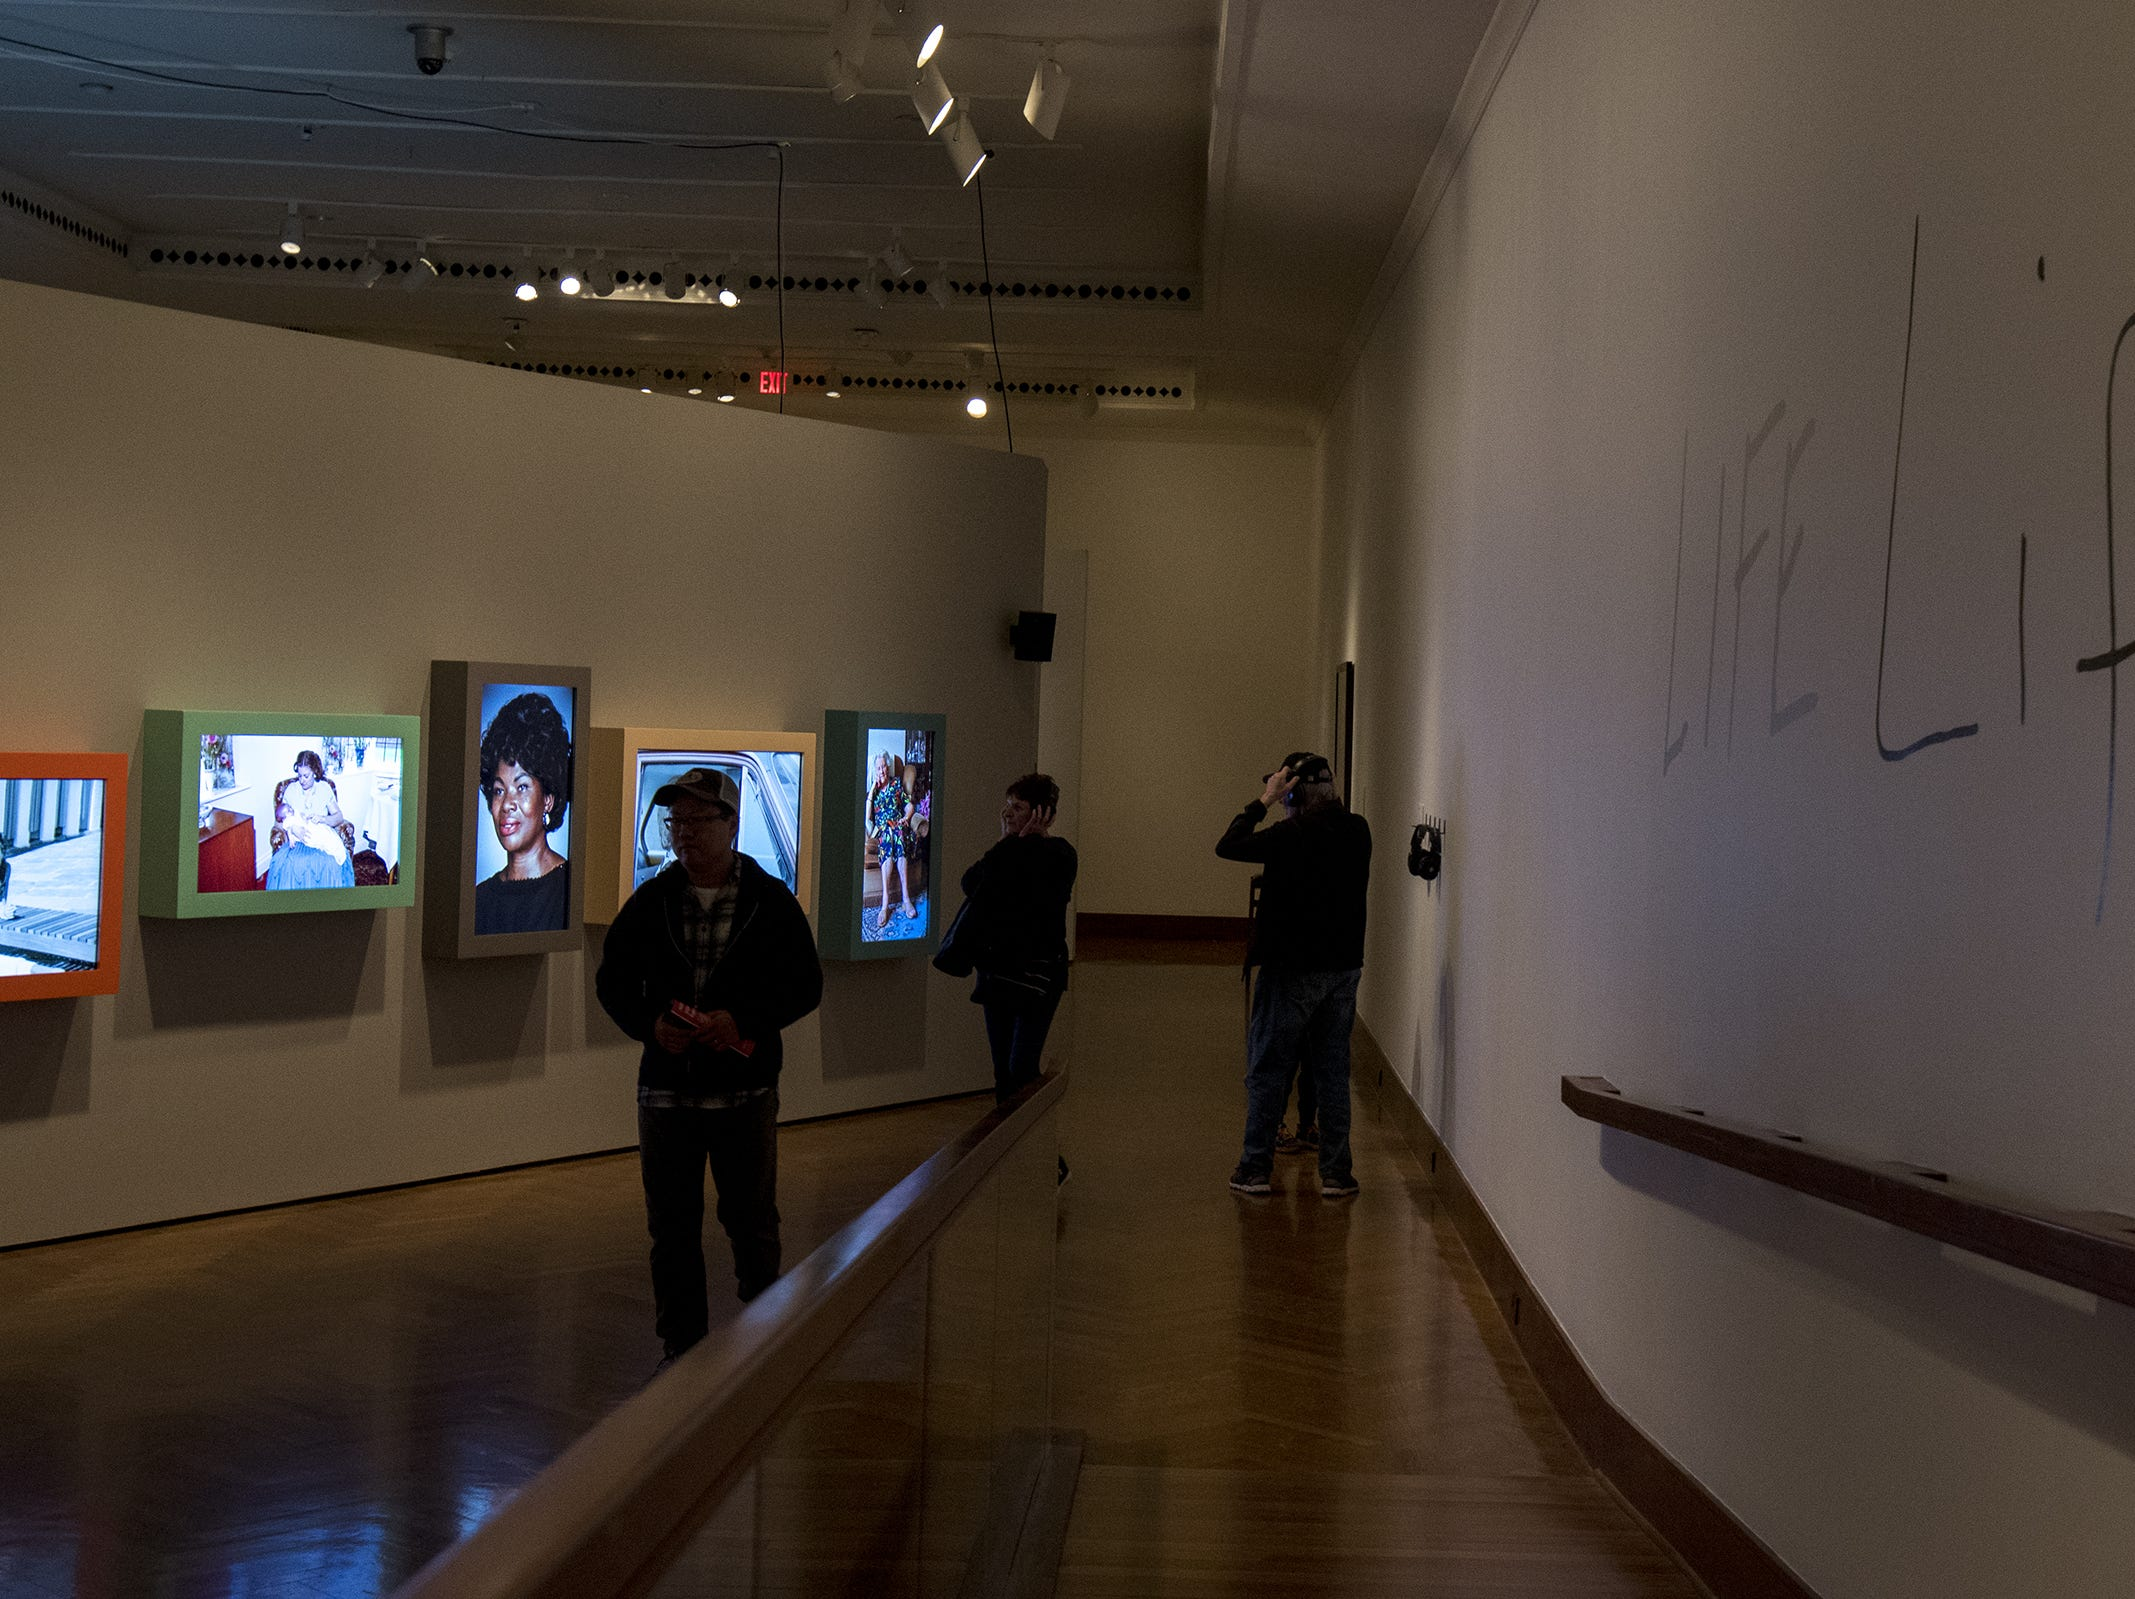 Guests listen to the audio tour of Life: Gillian Wearing during Art After Dark at Cincinnati Art Museum Wednesday, November 21, 2018 in Cincinnati, Ohio.